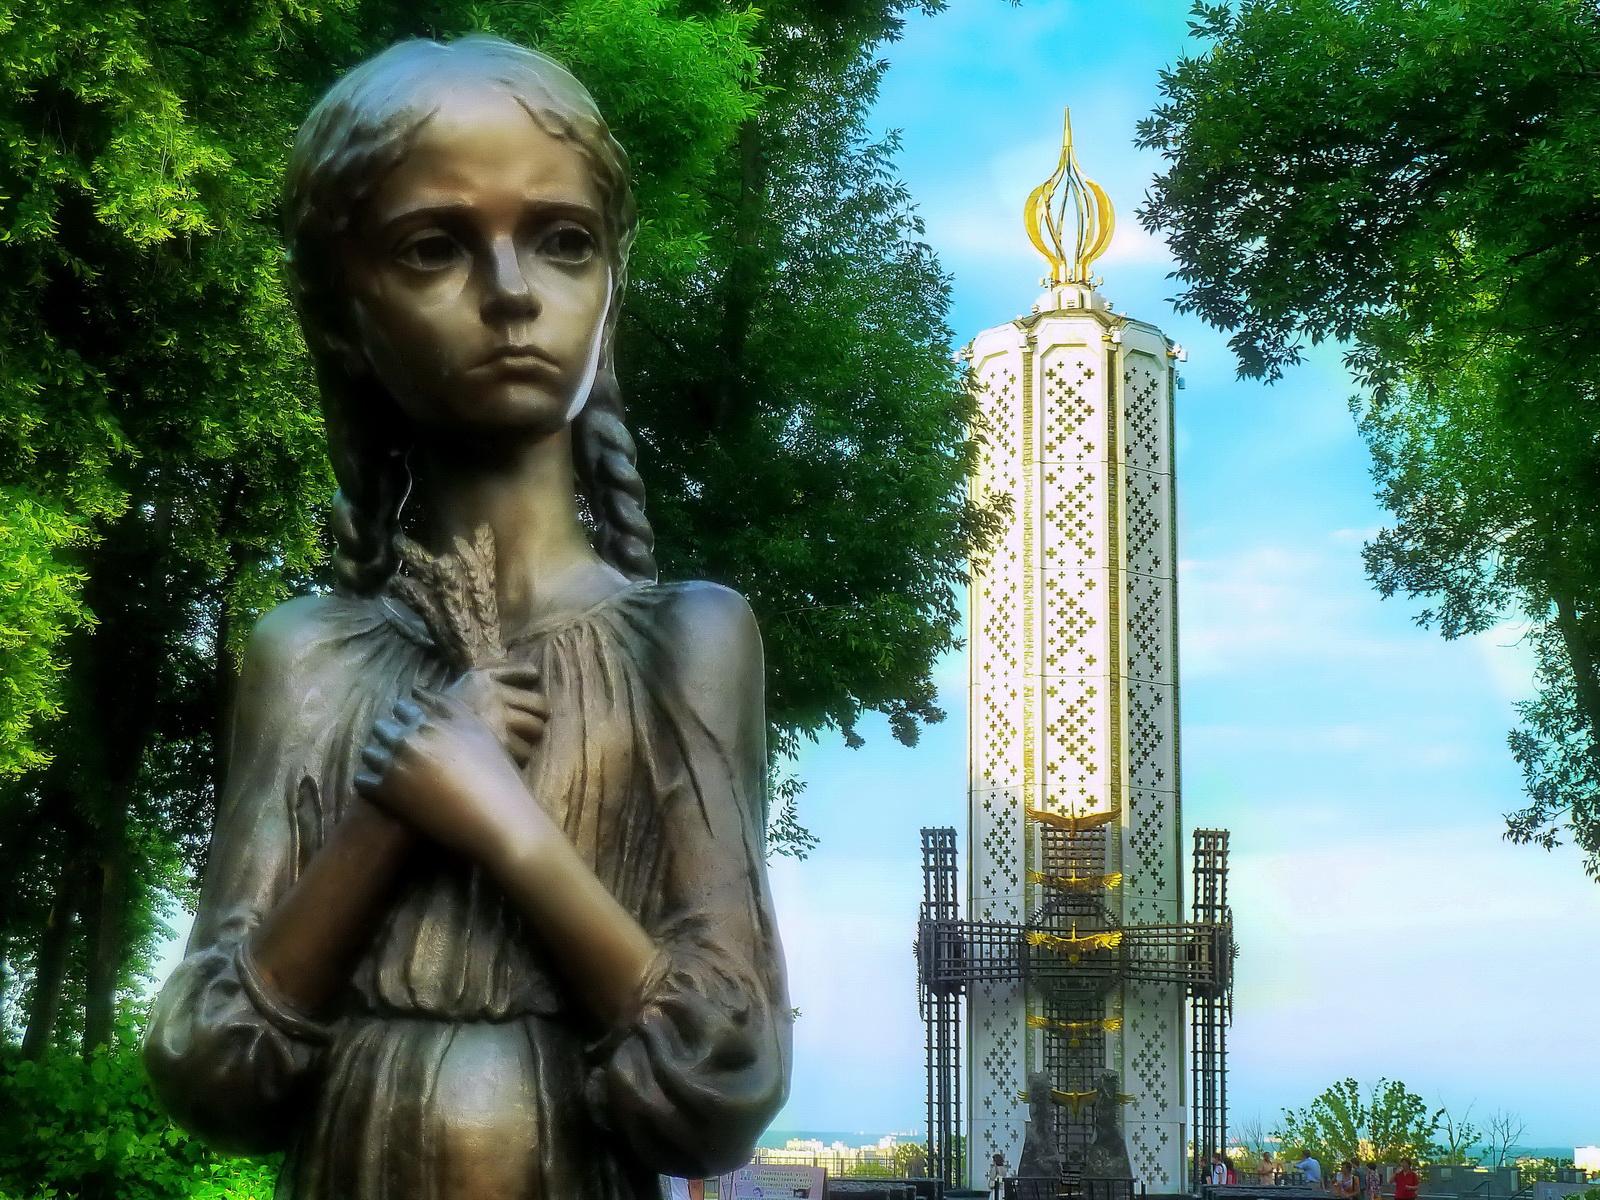 Memorial Holodomor 1932-33